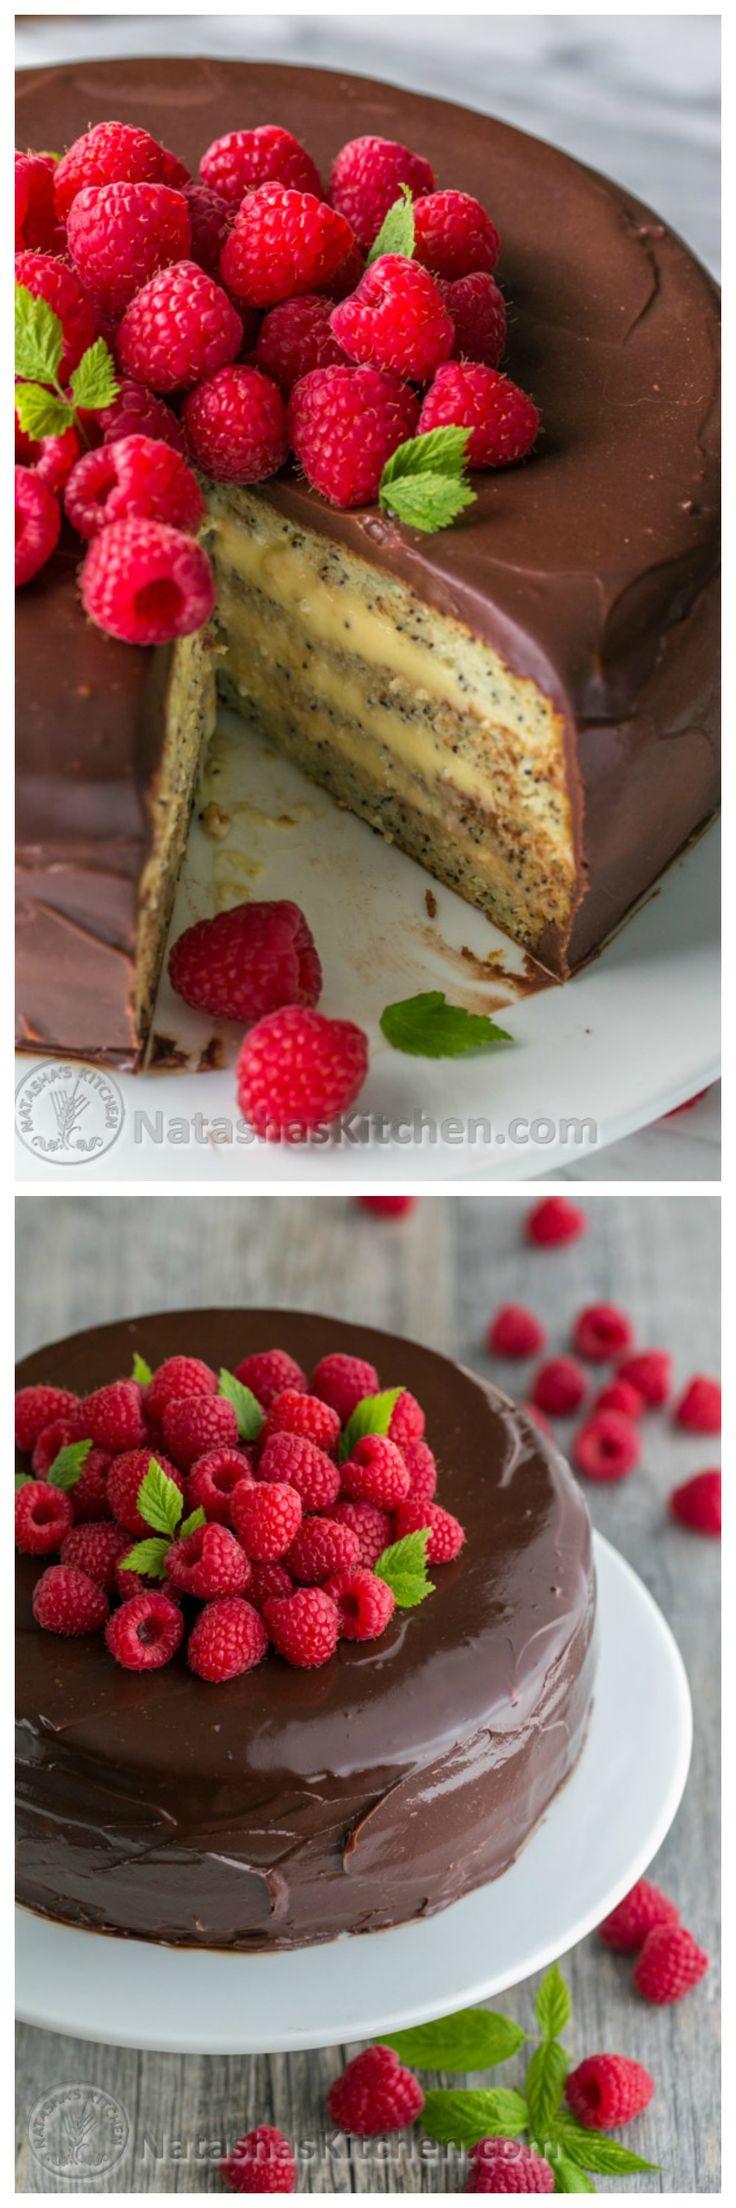 Poppy Seed Sour Cream Cake | NatashasKitchen.com